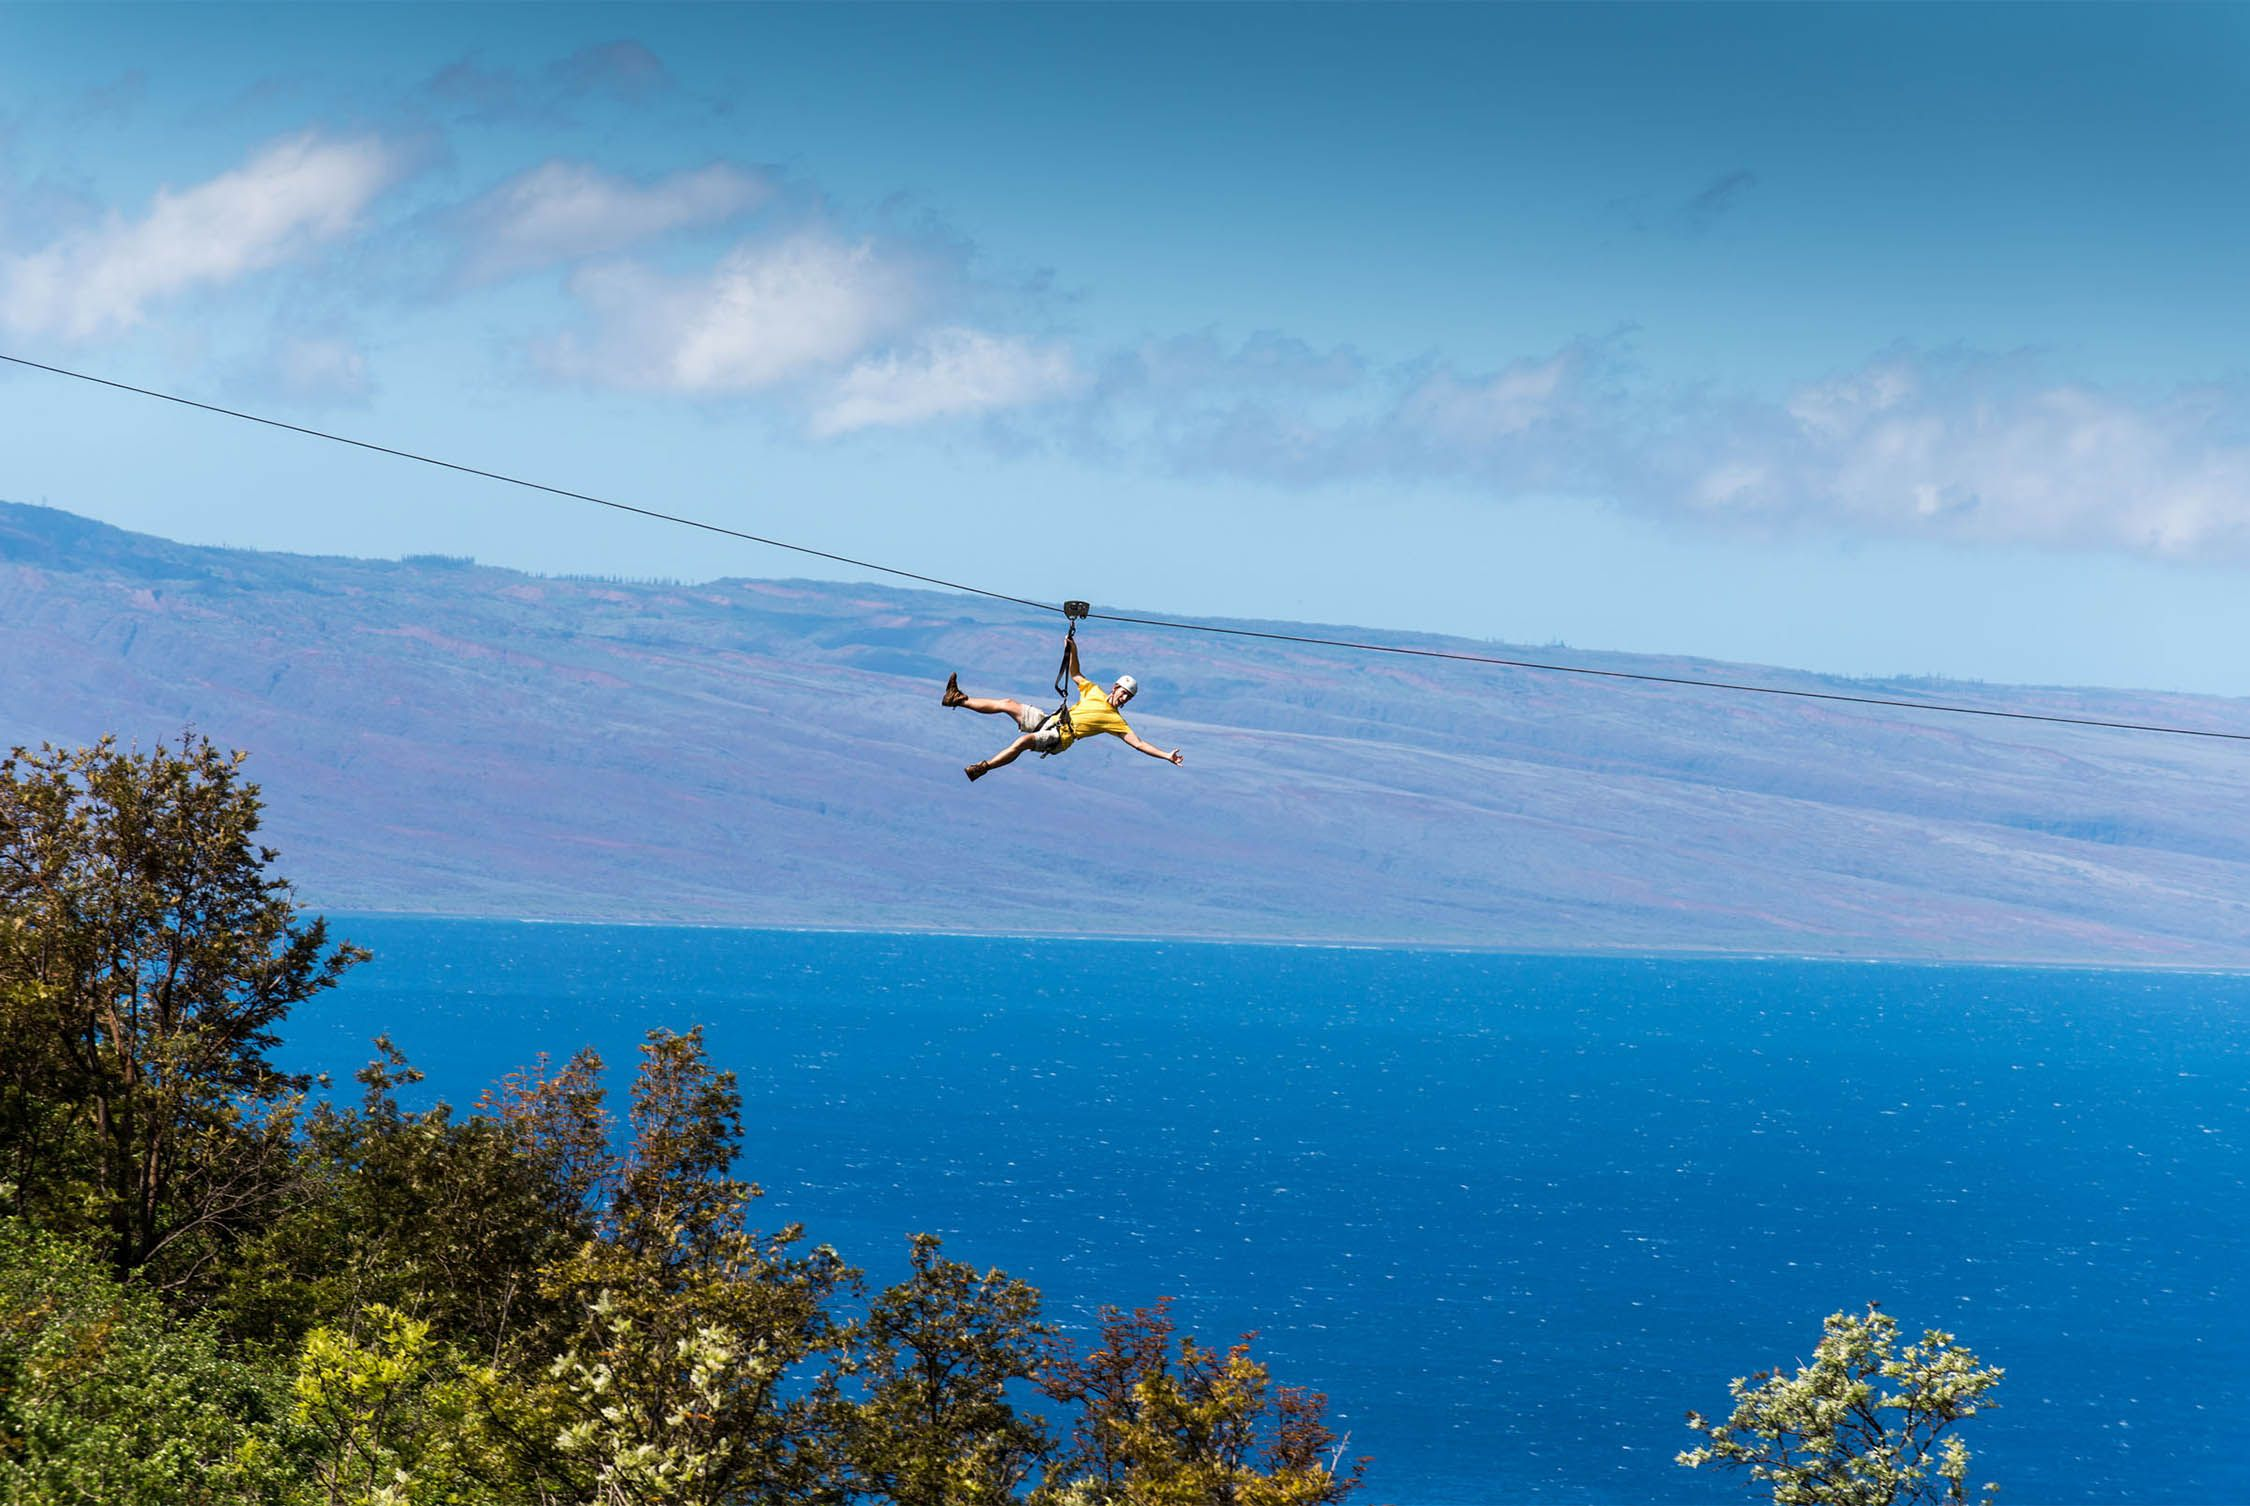 Maui Ka Anapali Zipline The 1 Zipline Tour In Hawaii Ziplining In Maui Trip To Maui Hawaii Vacation